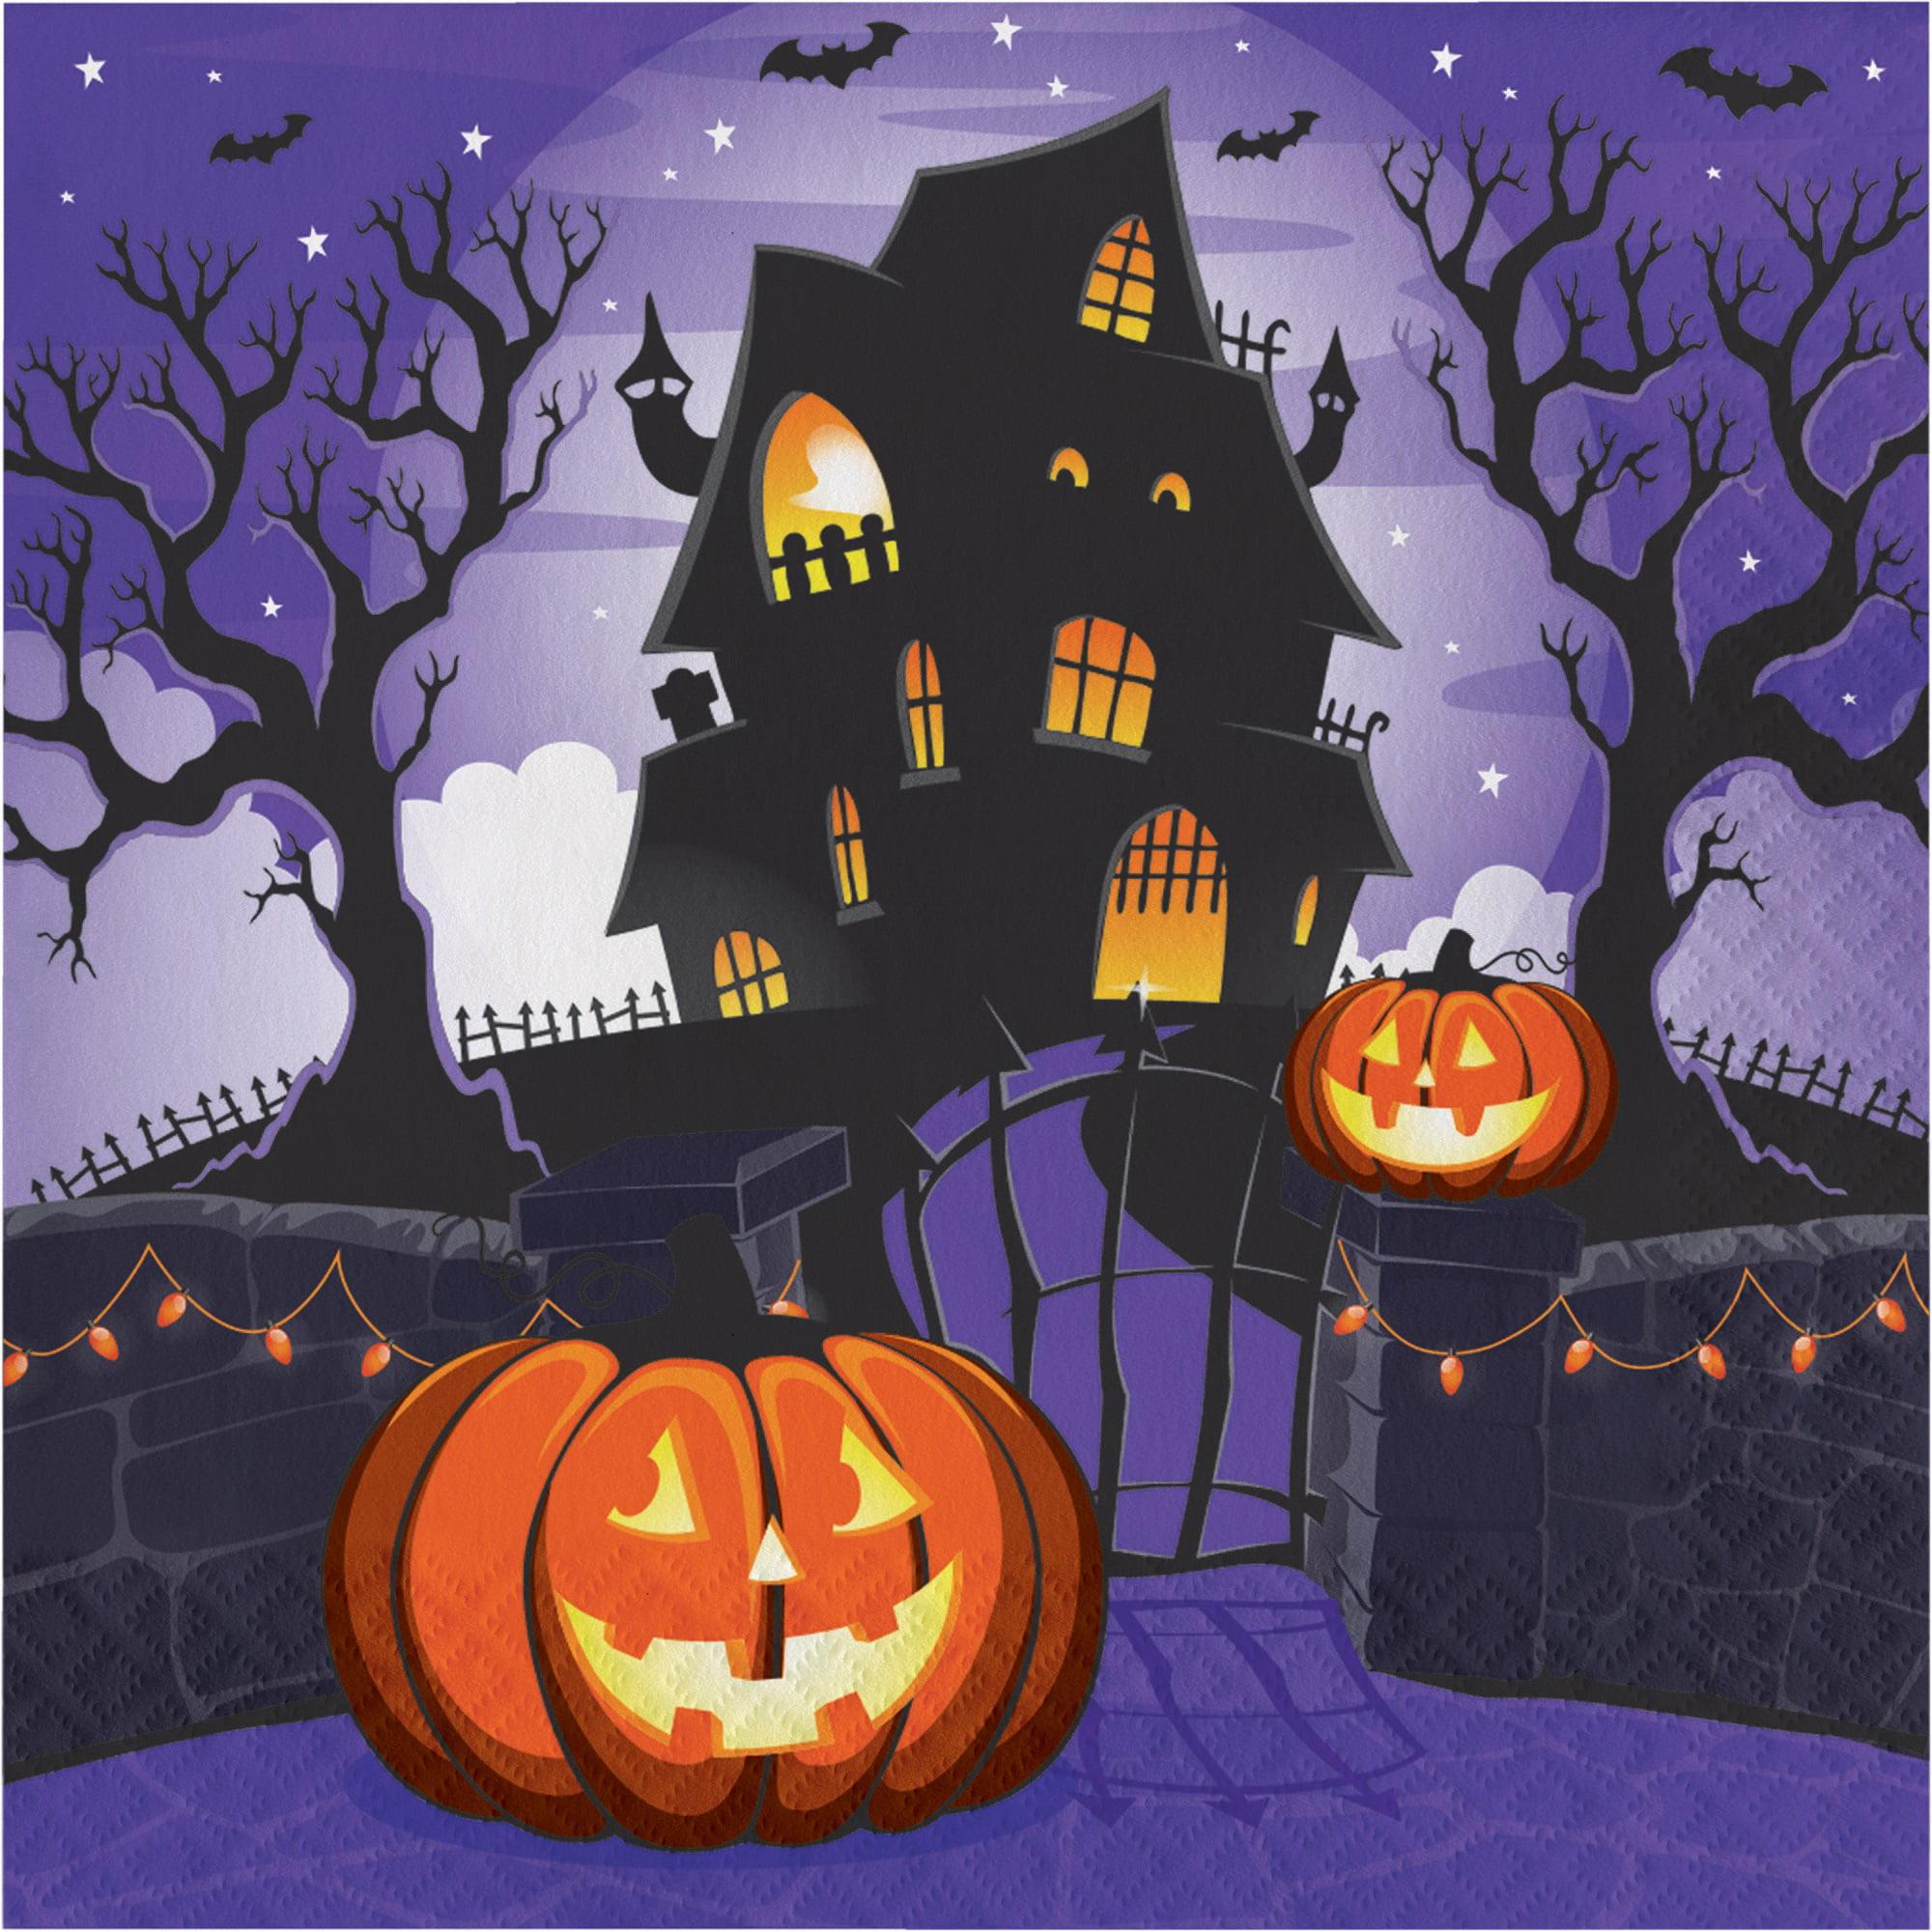 Haunted House Pumpkin Halloween 16 Ct 6 5 Luncheon Napkins Walmart Com Walmart Com